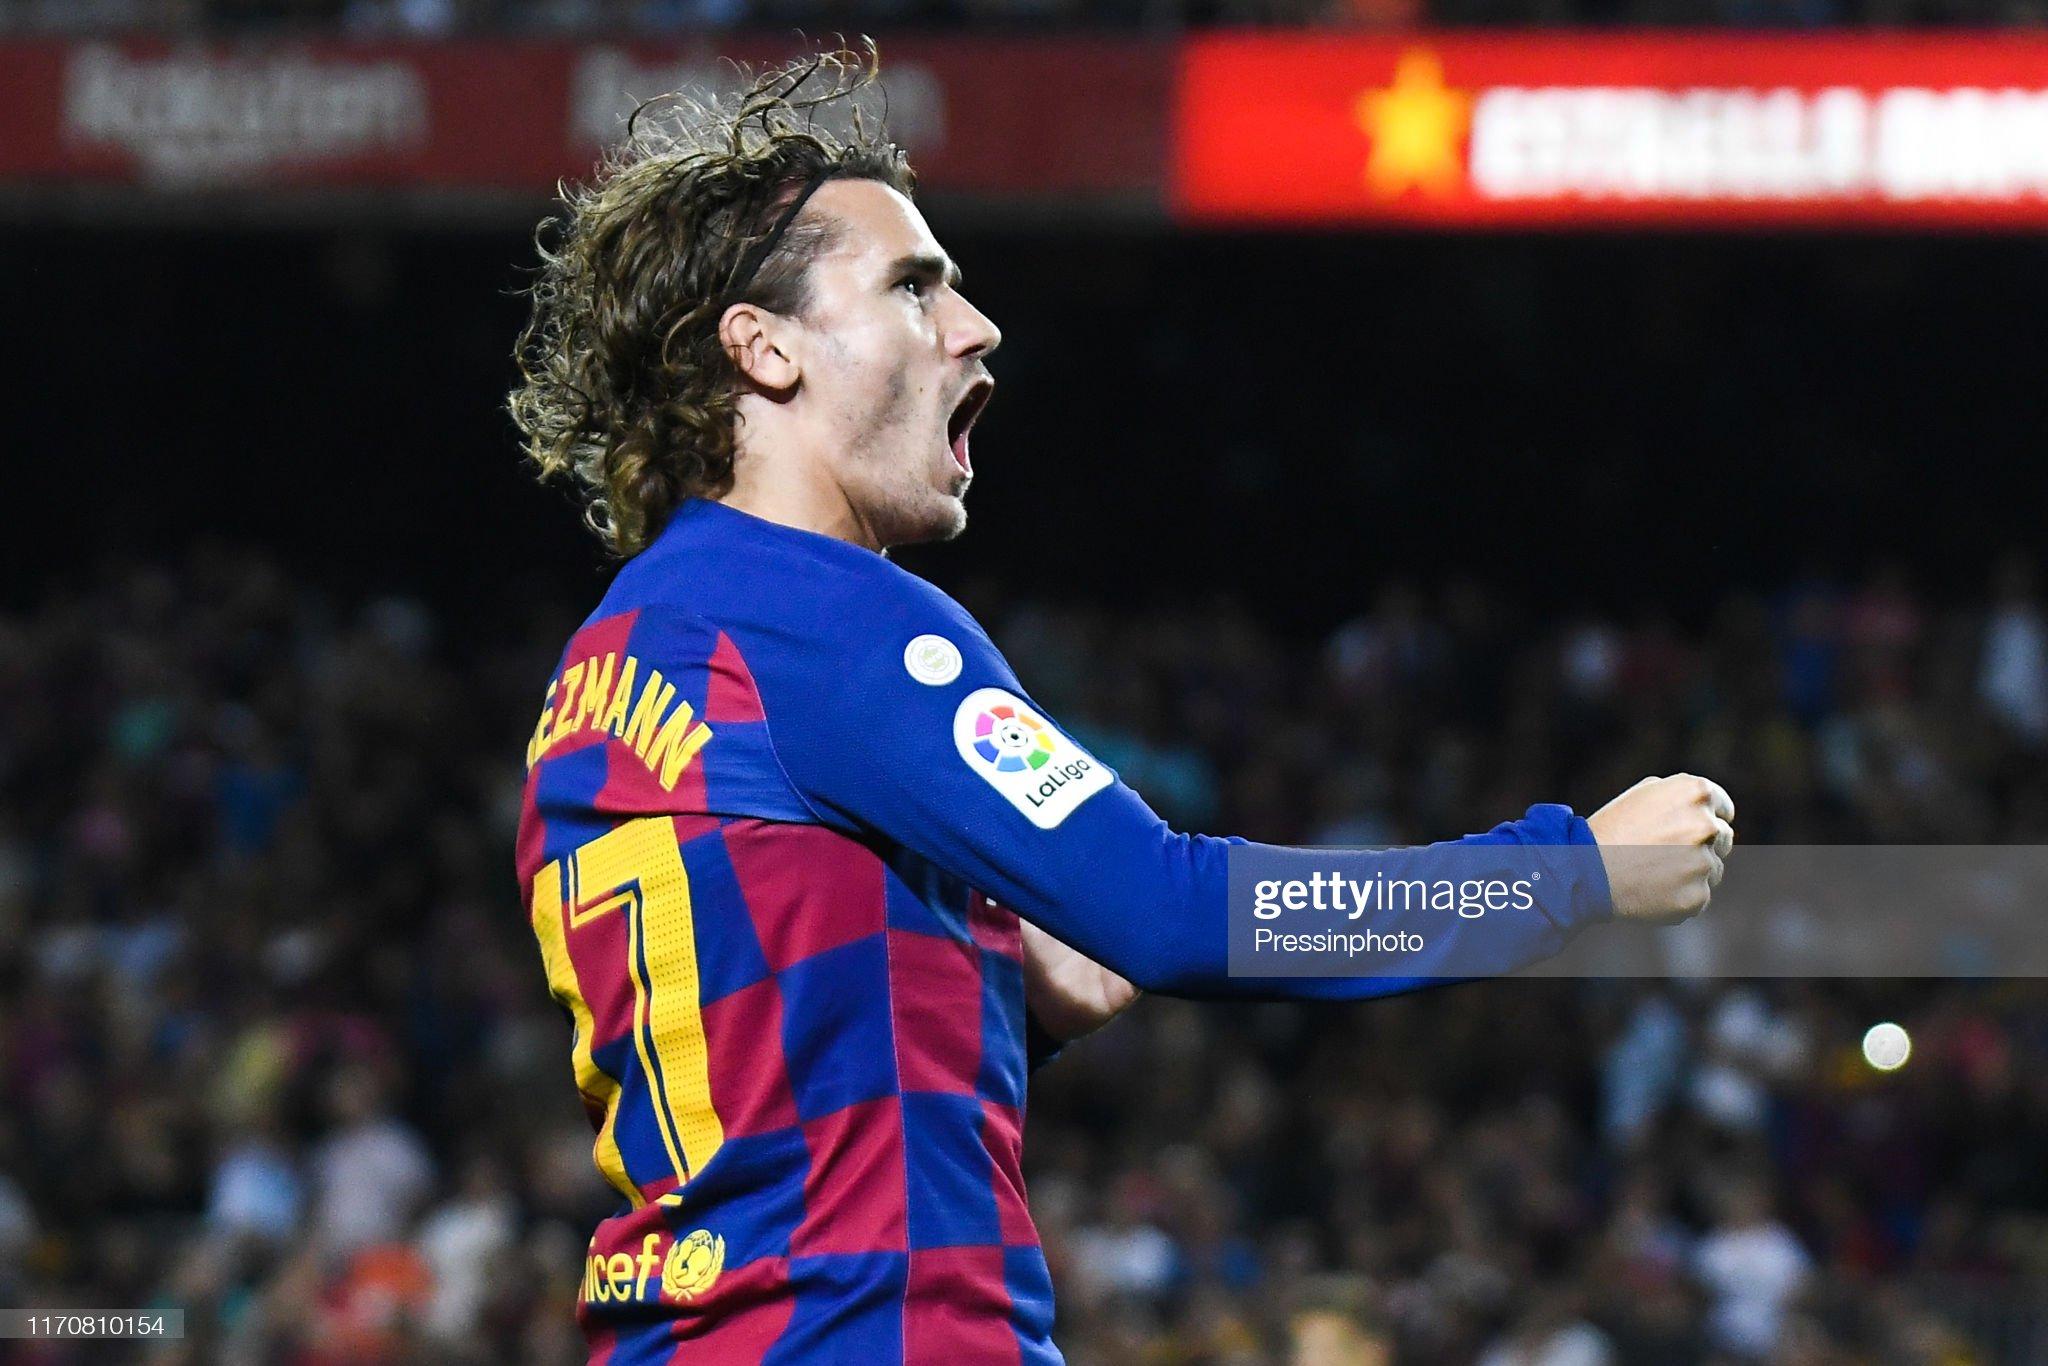 صور مباراة : برشلونة - فياريال 2-1 ( 24-09-2019 )  Antoine-griezmann-of-fc-barcelona-celebrates-his-goal-during-the-liga-picture-id1170810154?s=2048x2048